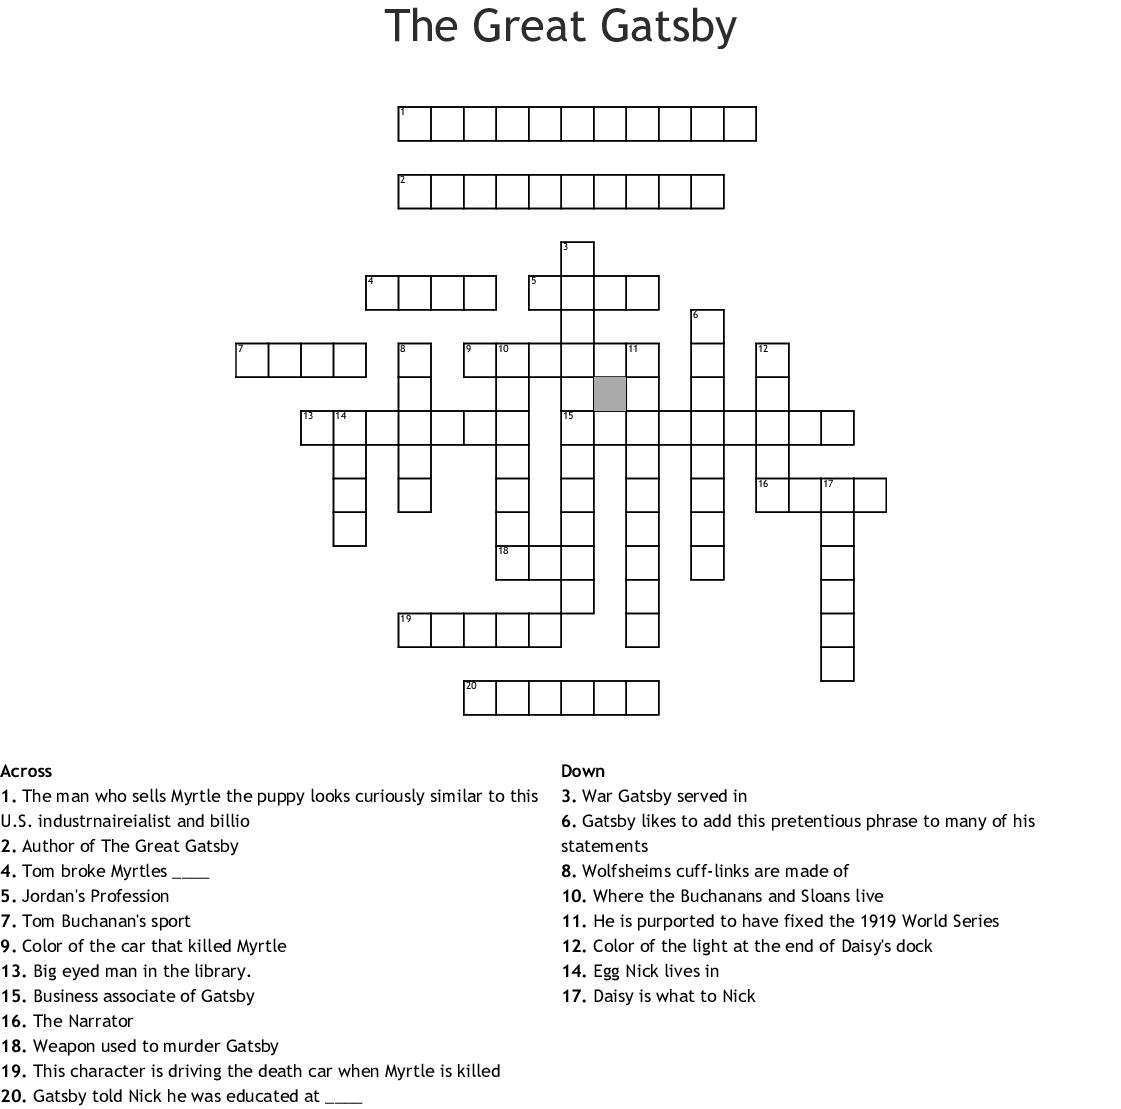 The Great Gatsby Crossword - WordMint